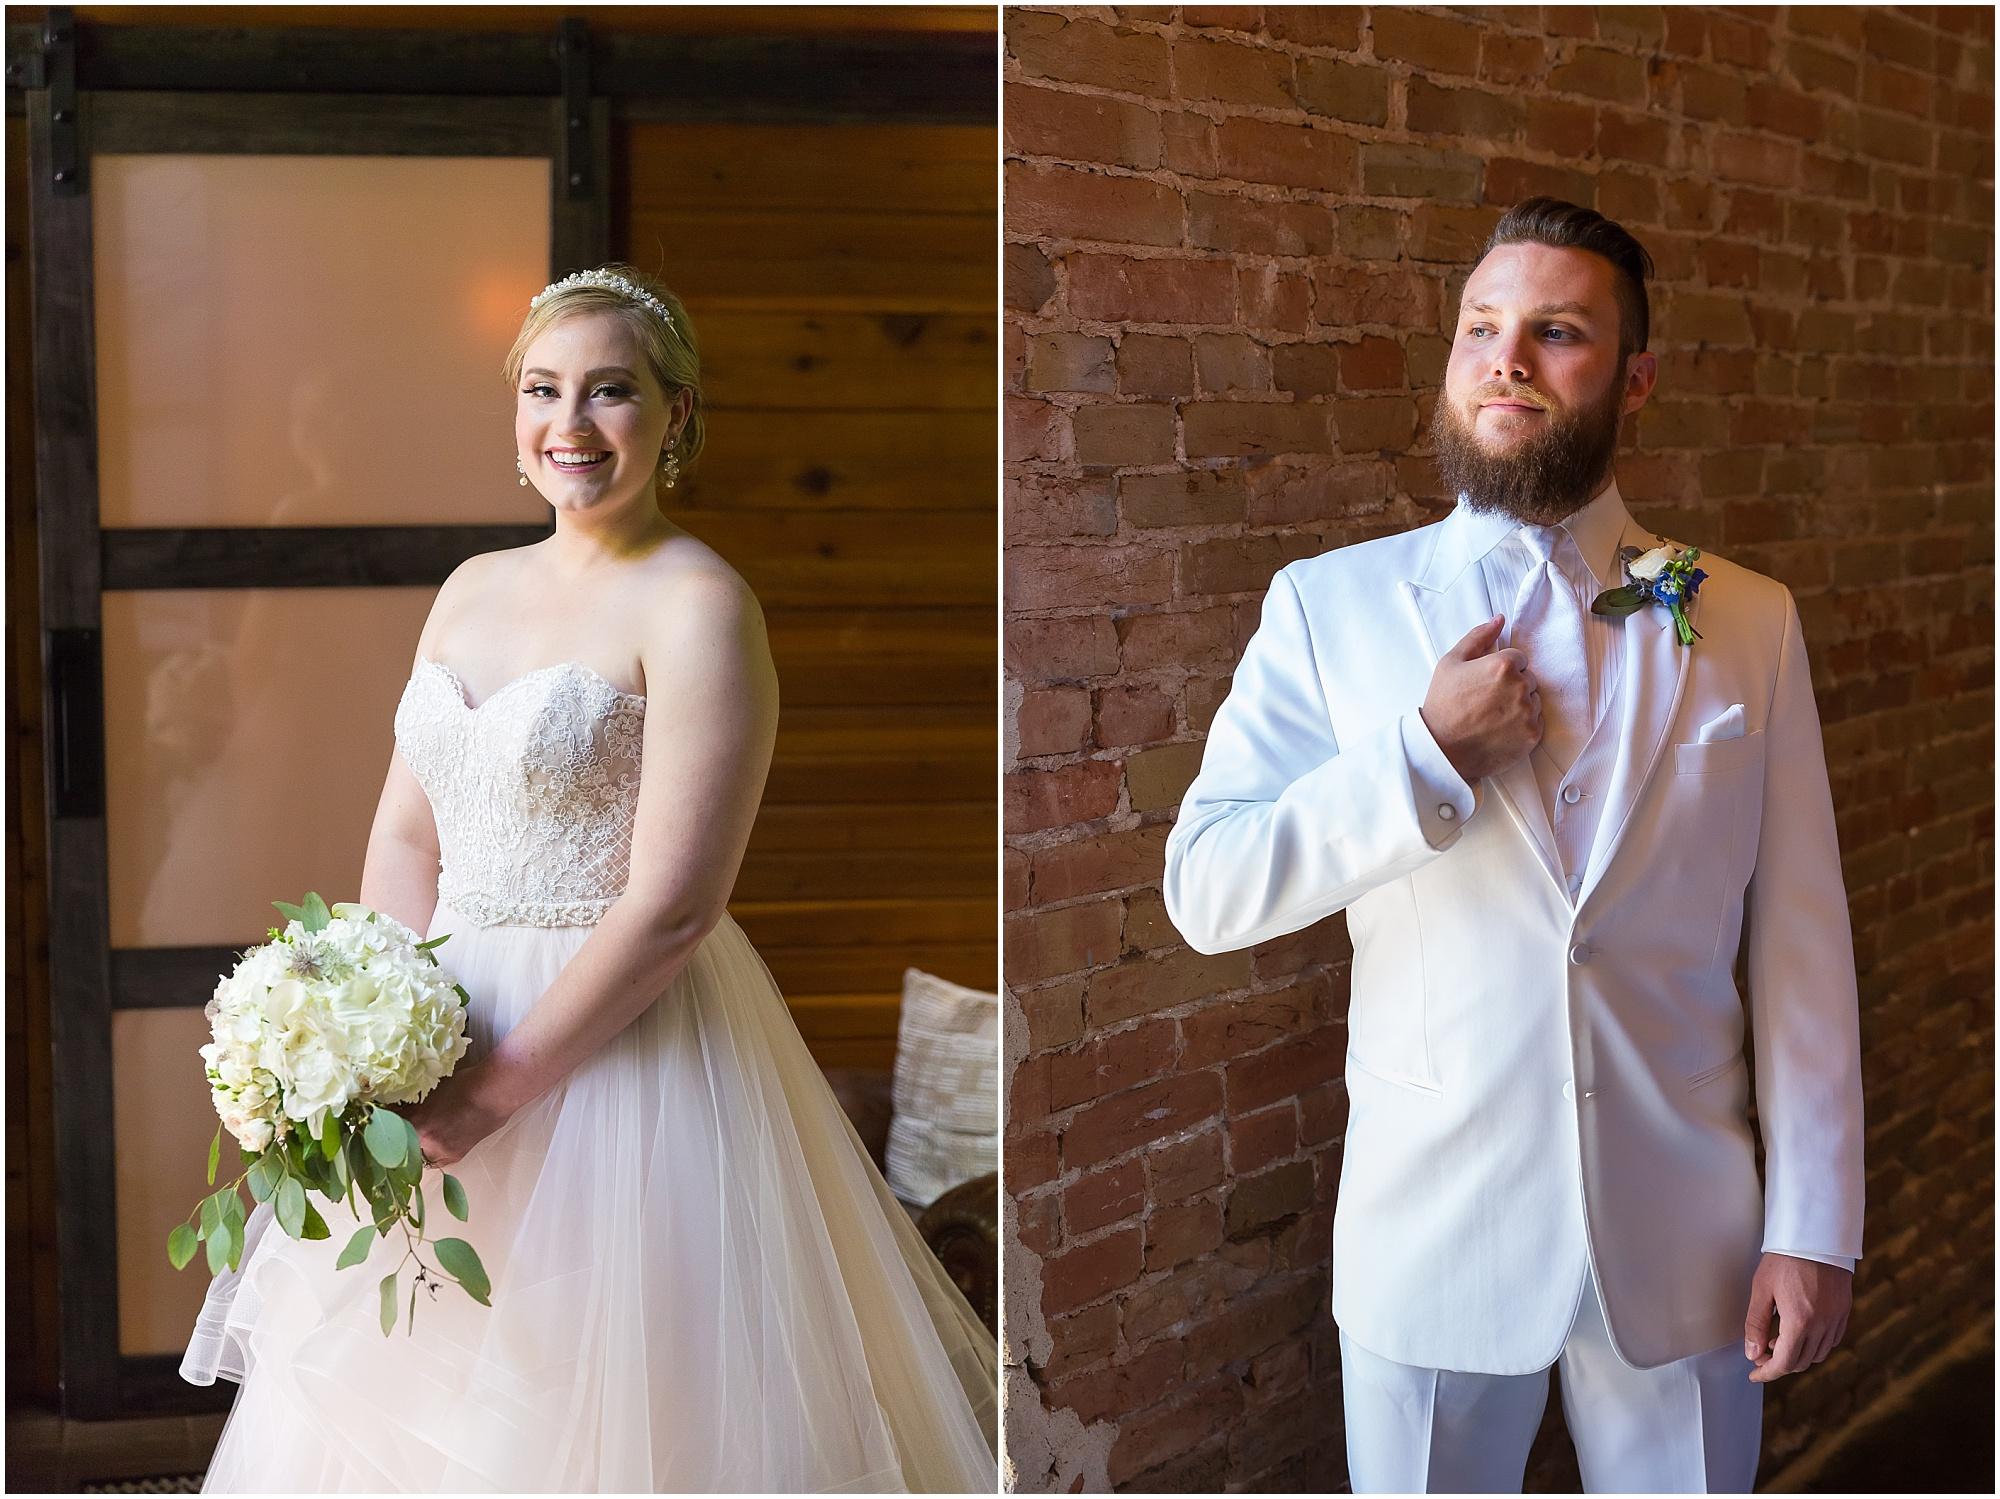 Bride in blush wedding gown, groom in white tux for their downtown Waco wedding - www.jasonandmelaina.com